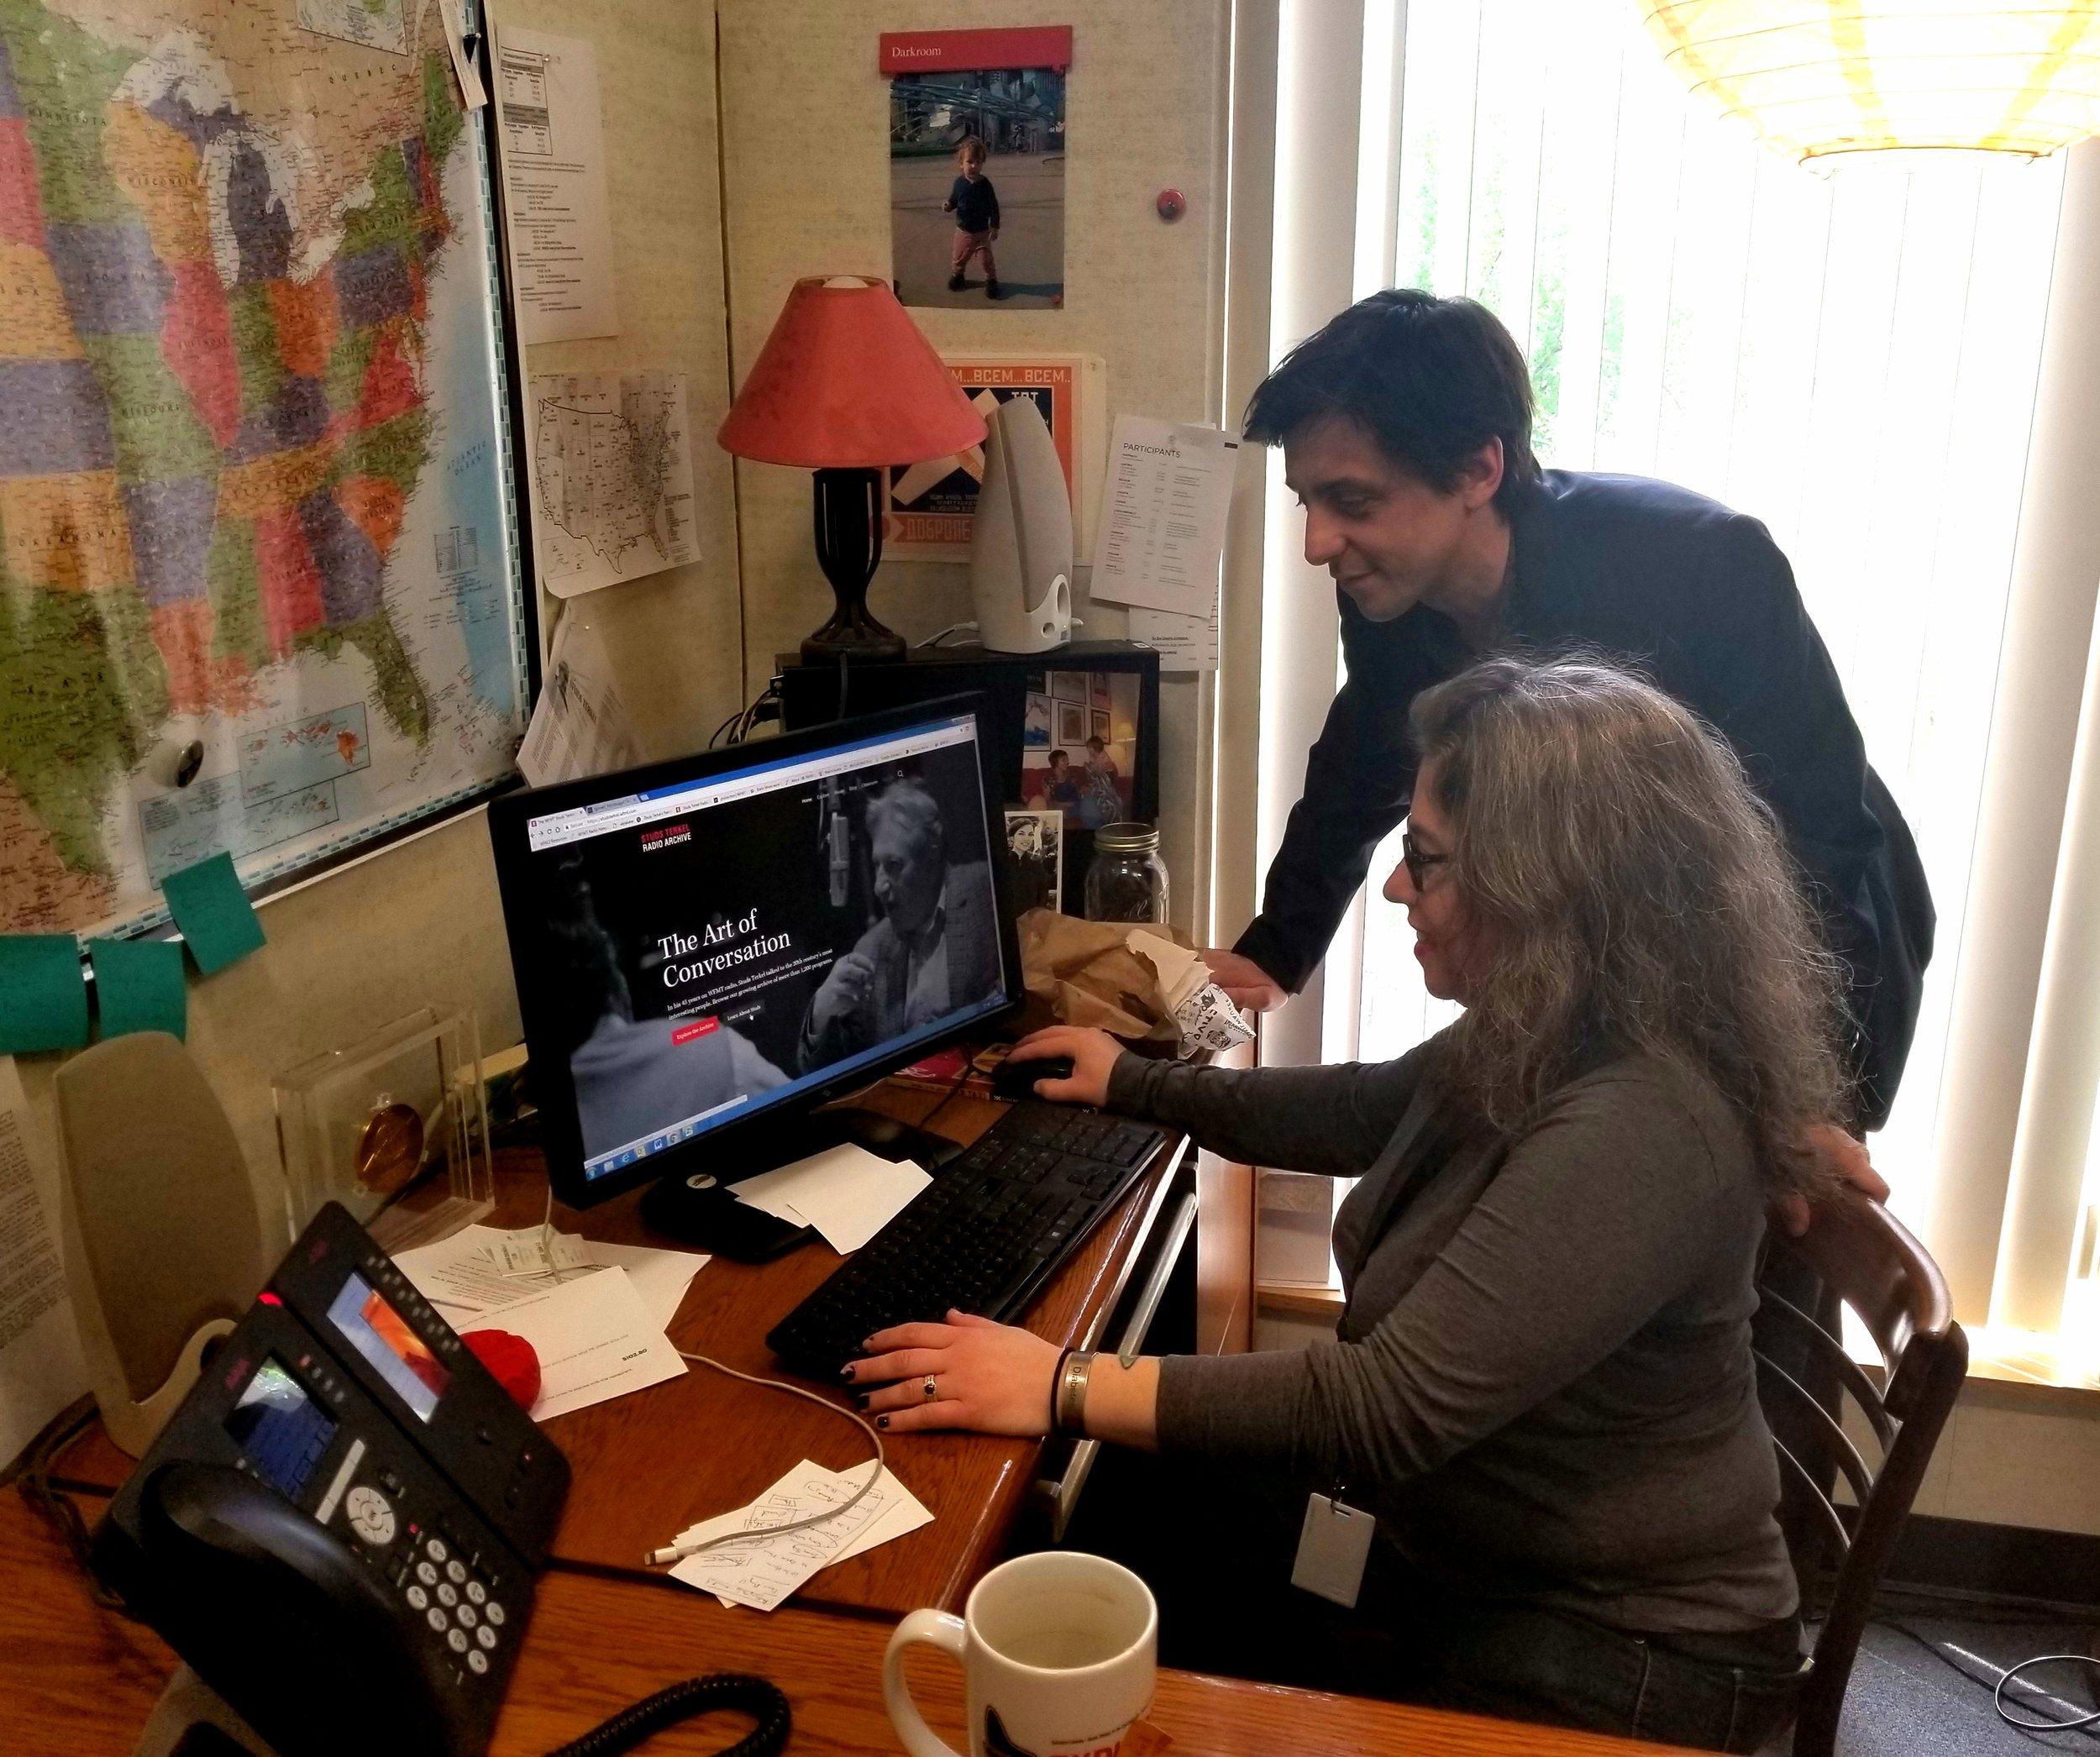 Tony Macaluso, Director of WFMT Radio Network & Studs Terkel Radio Archive and Allison Schein Holmes, WFMT archivist